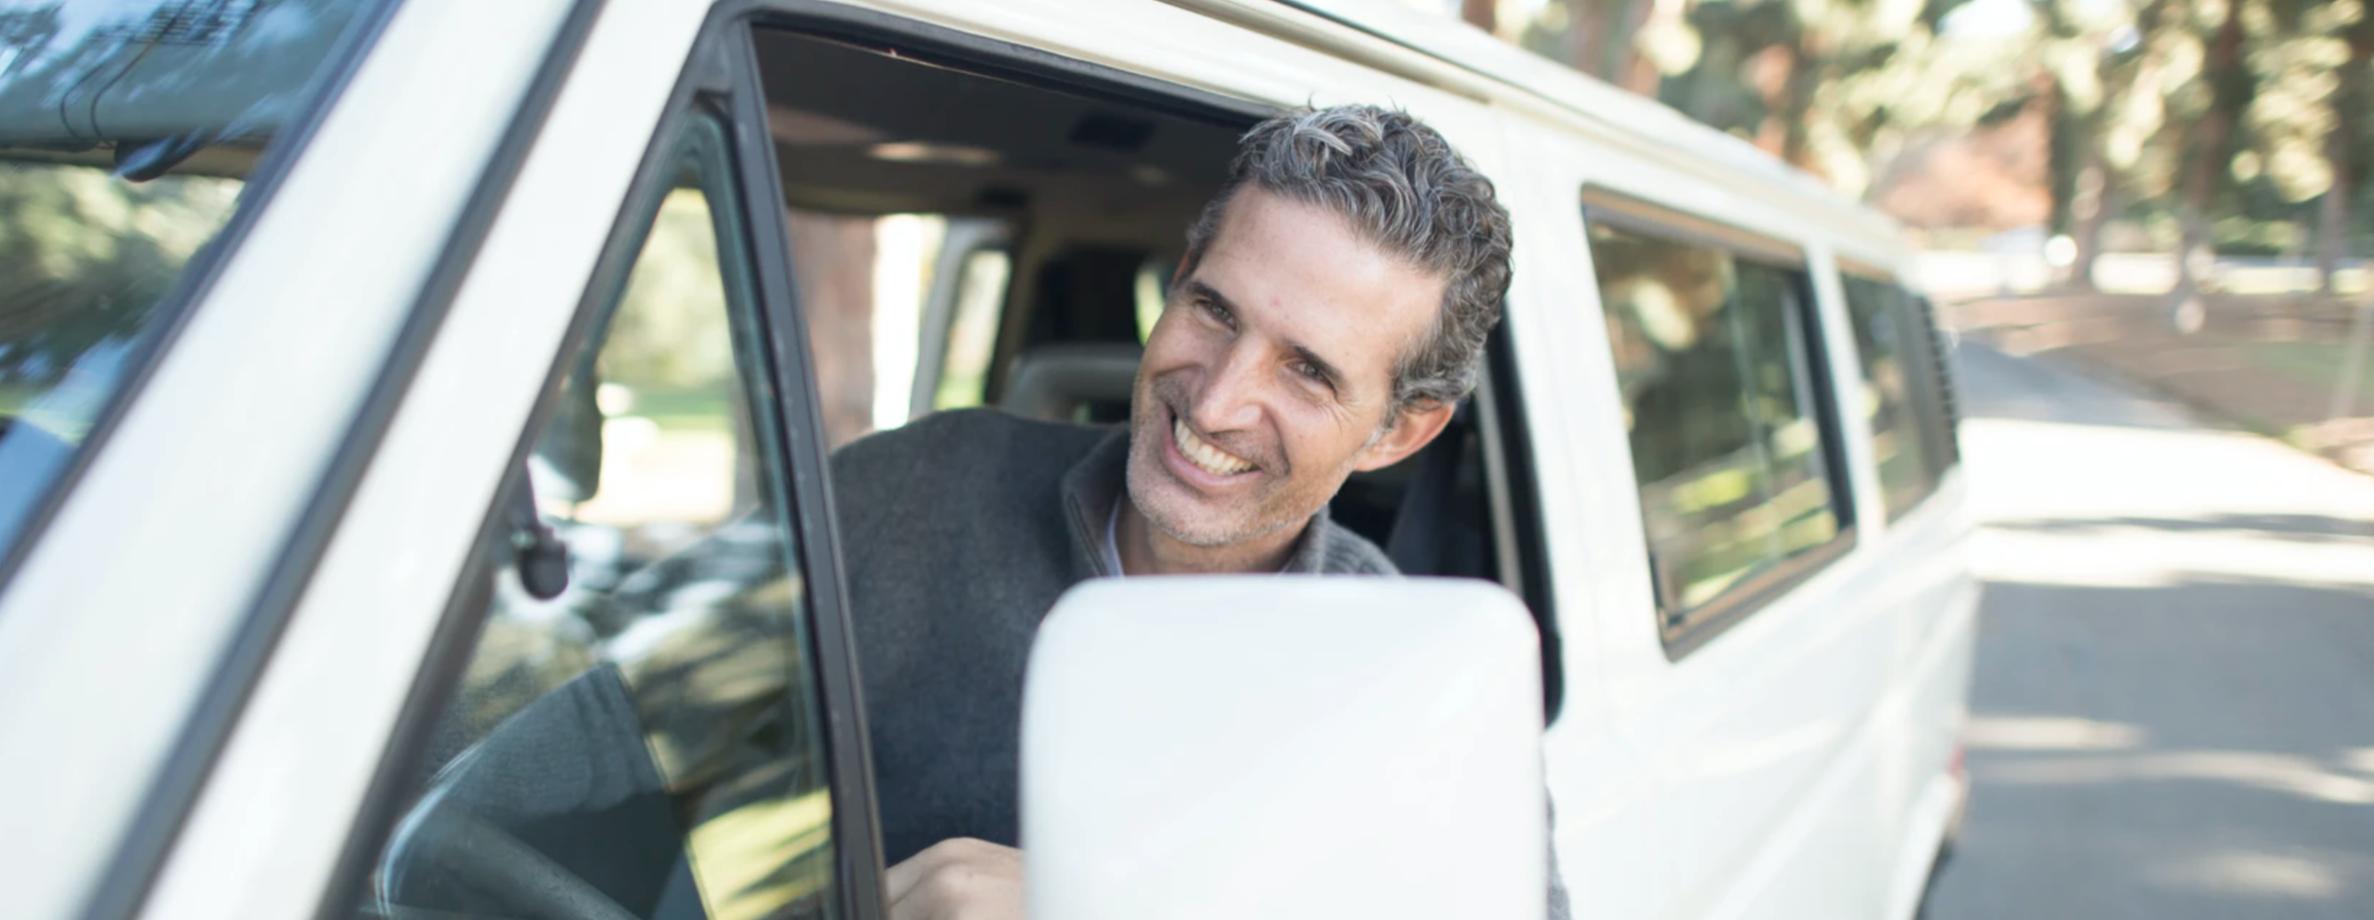 man getting New auto loan